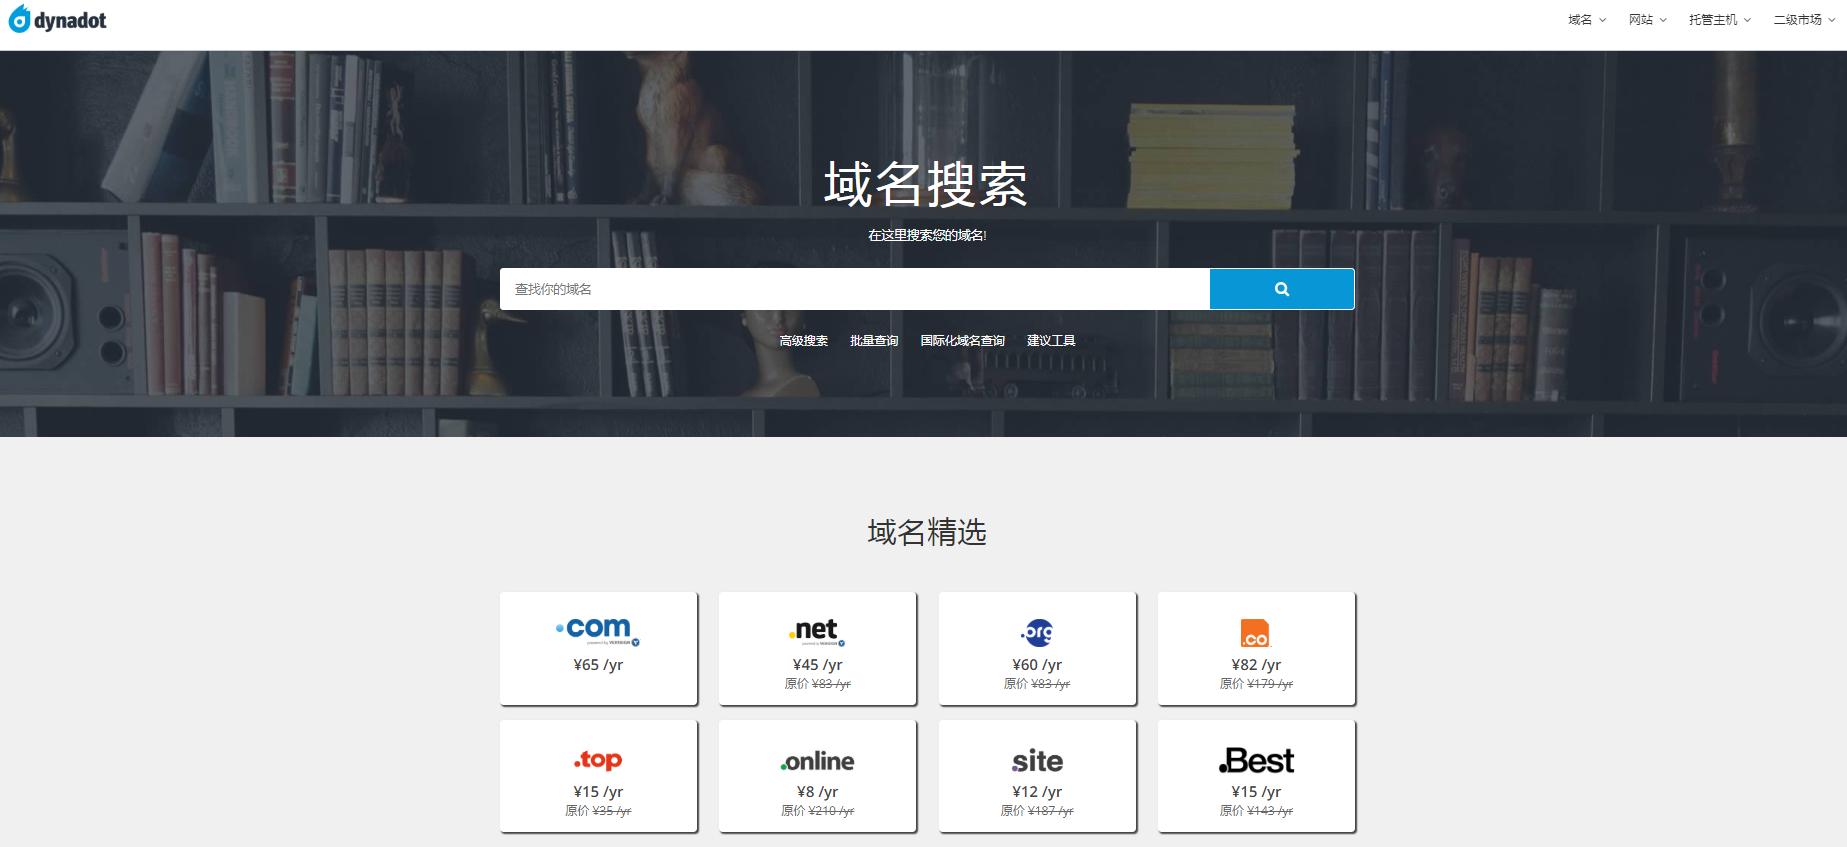 Dynadot官方网站